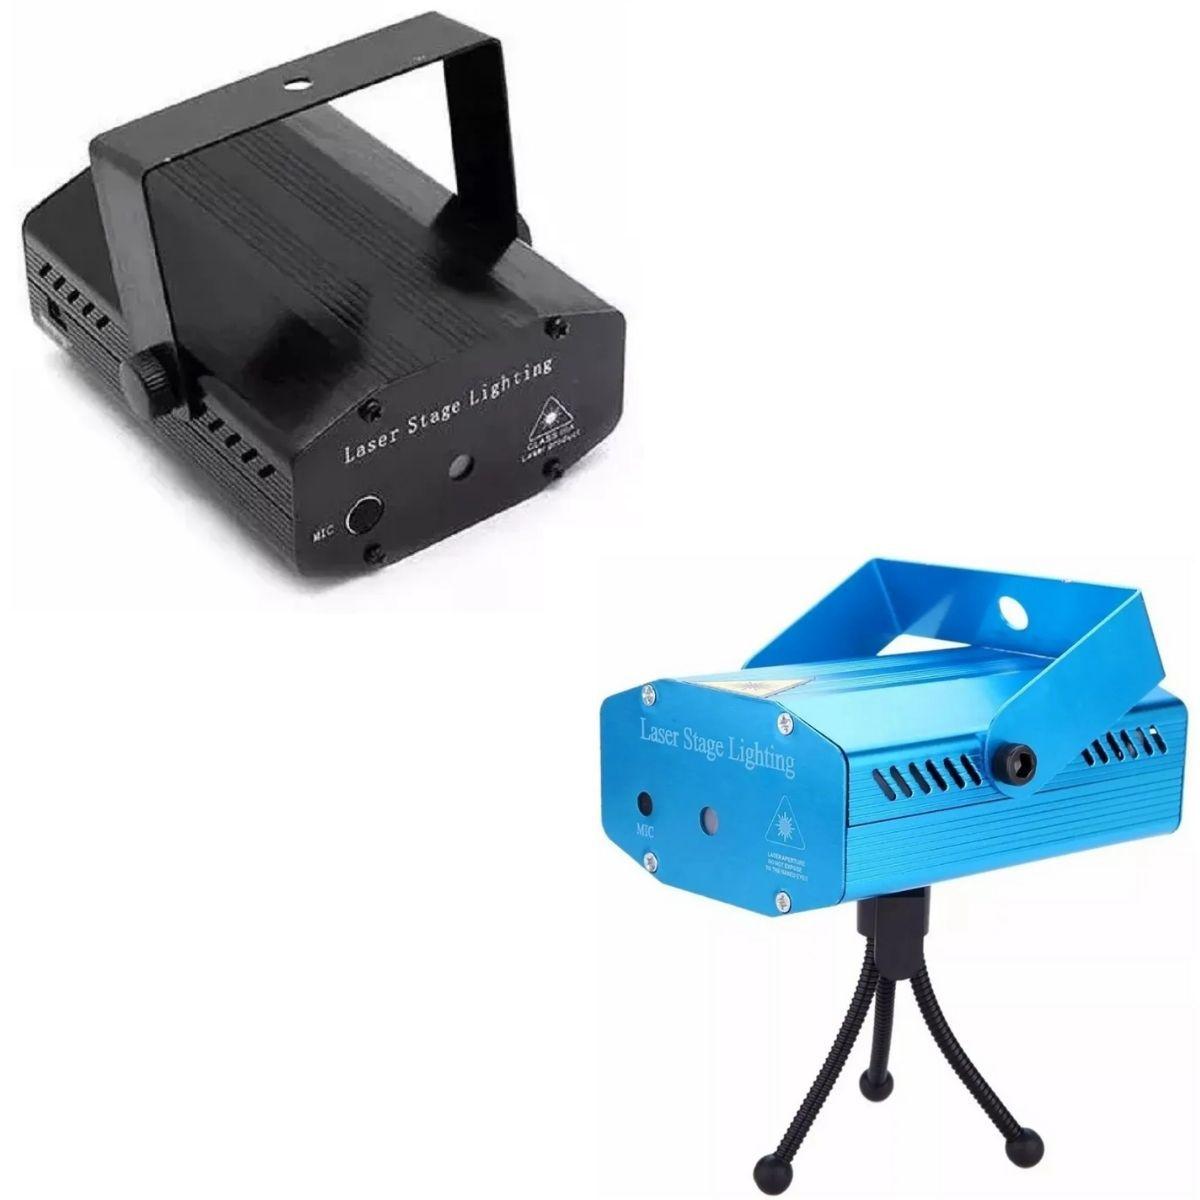 Mini Laser Projetor Holográfico Stage Lighting Preto E Azul - SD-126